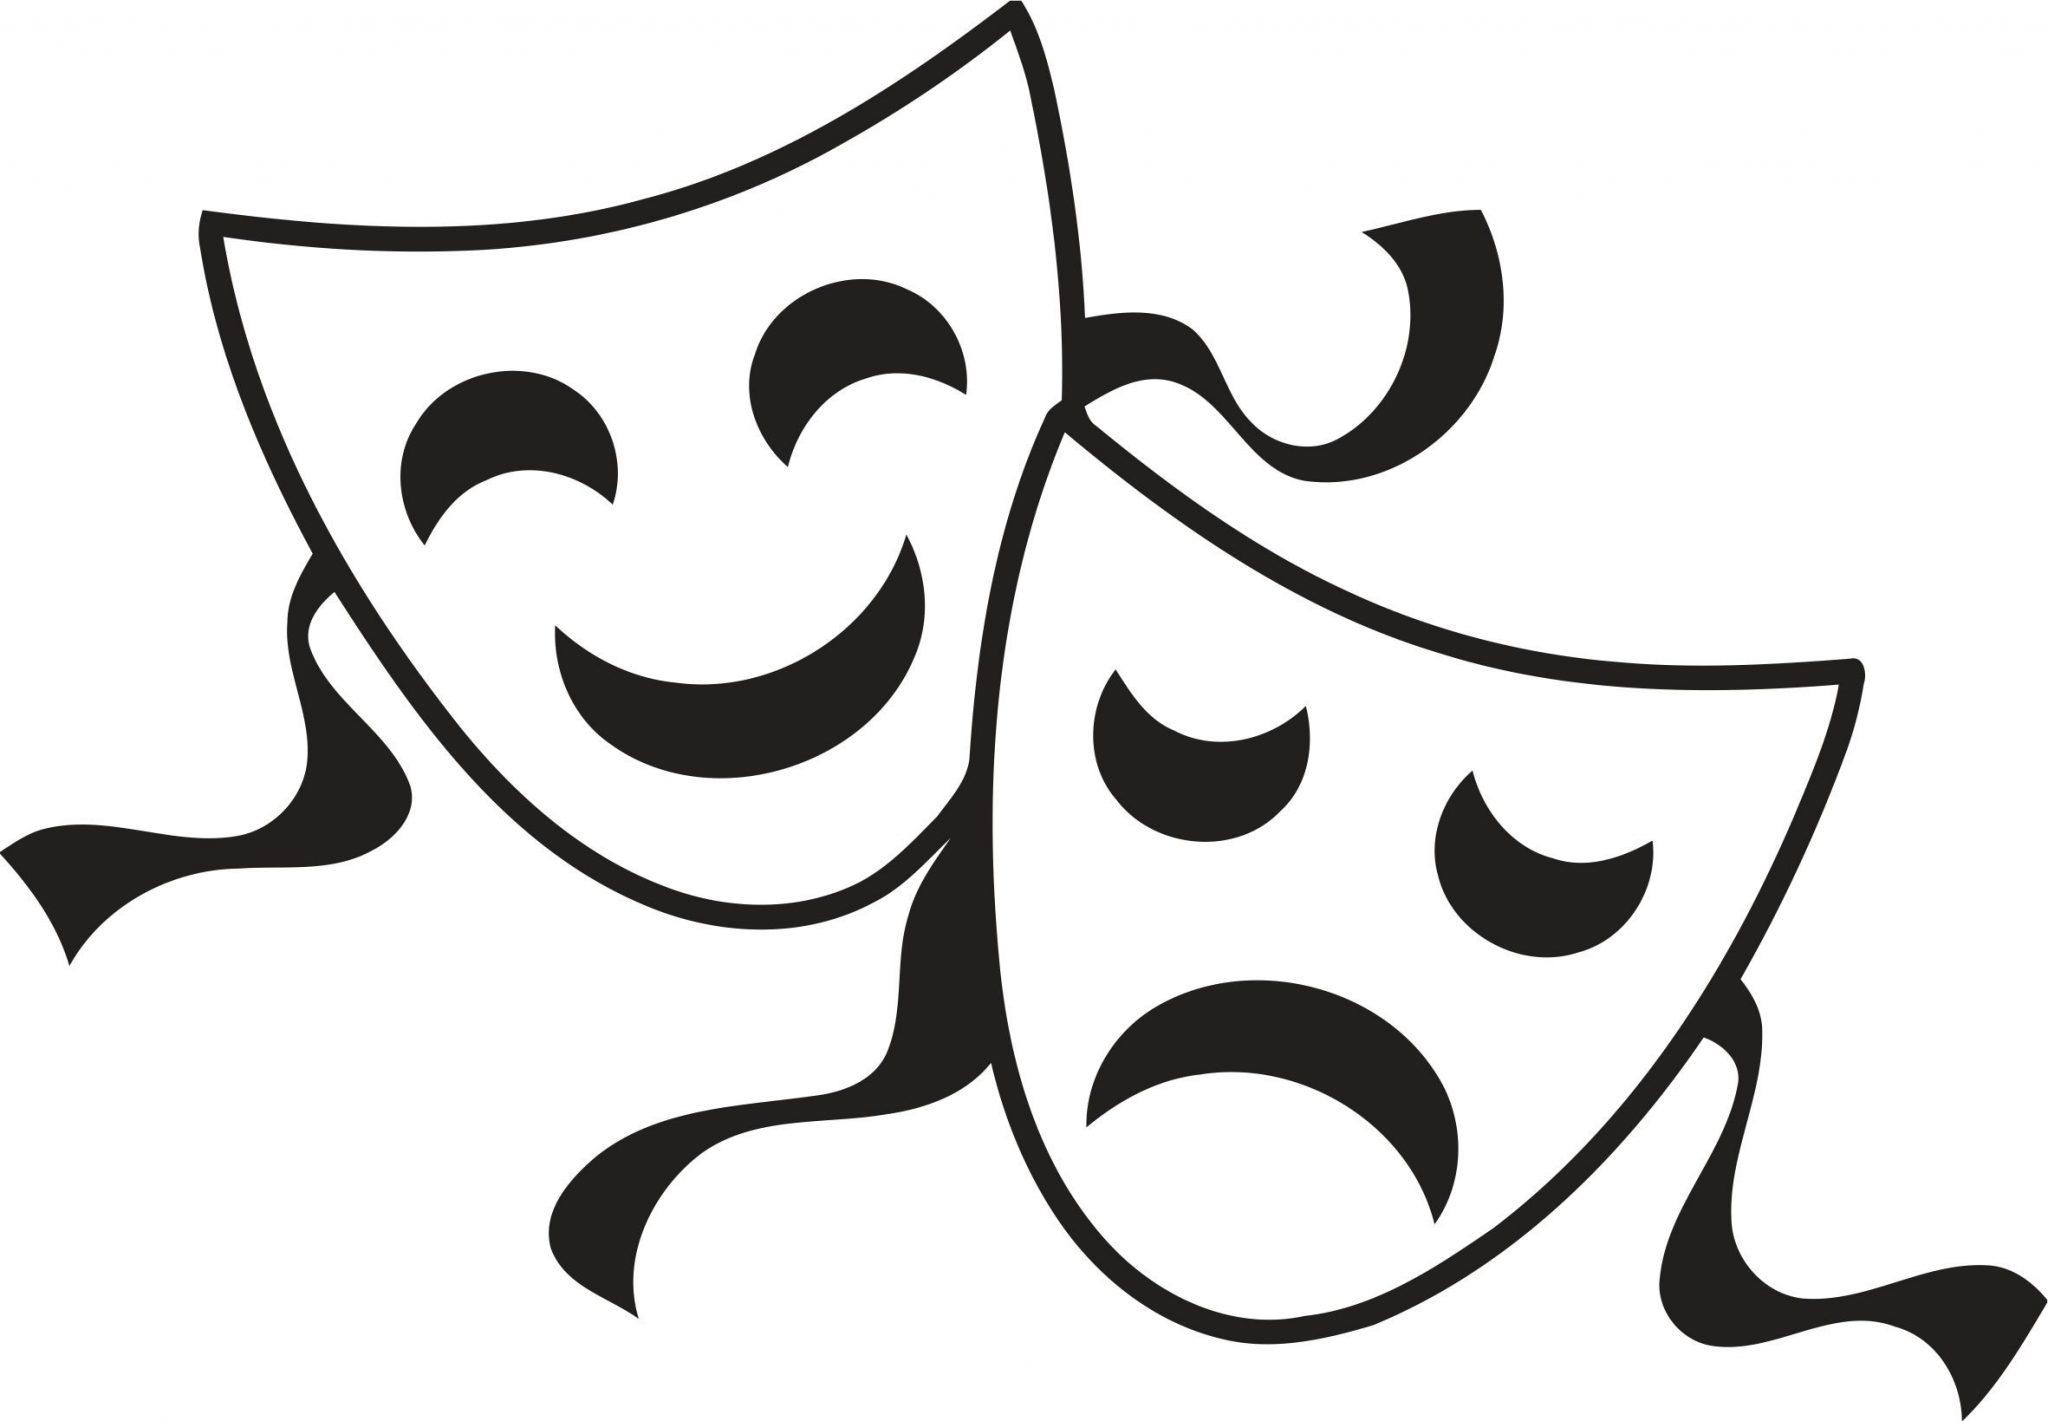 Drama clipart speech drama, Drama speech drama Transparent.